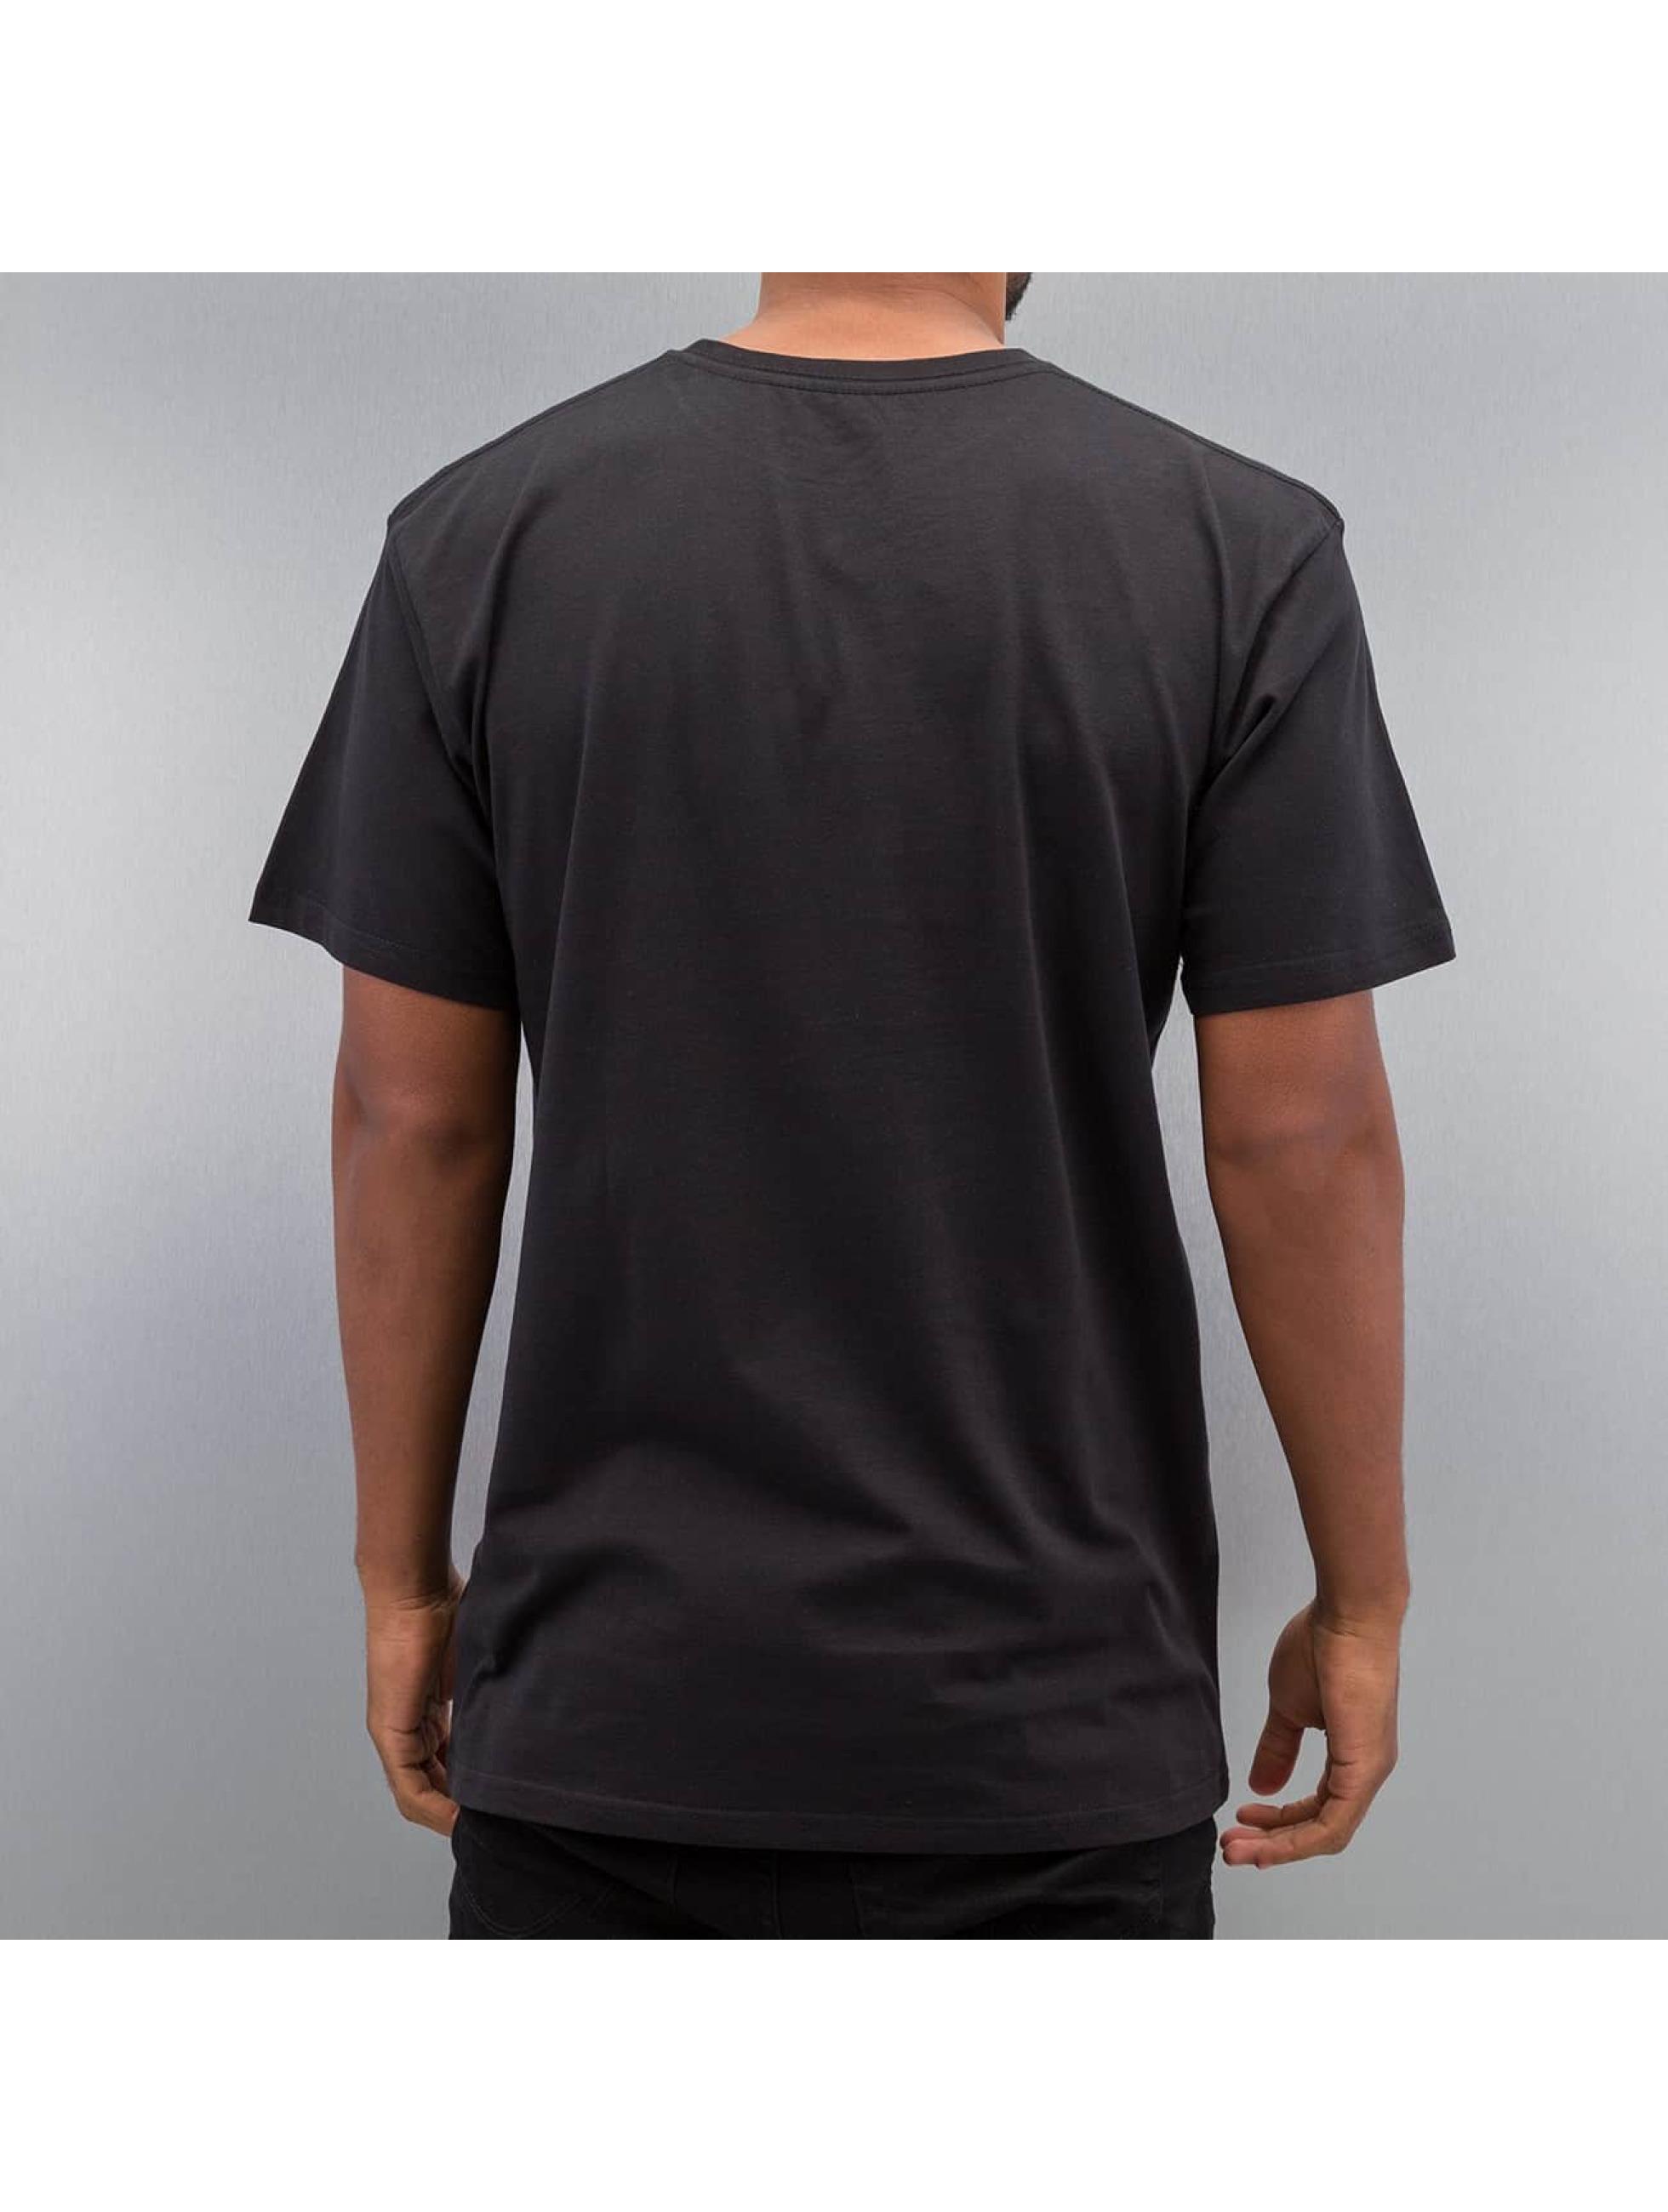 Quiksilver T-Shirt Mugshot black